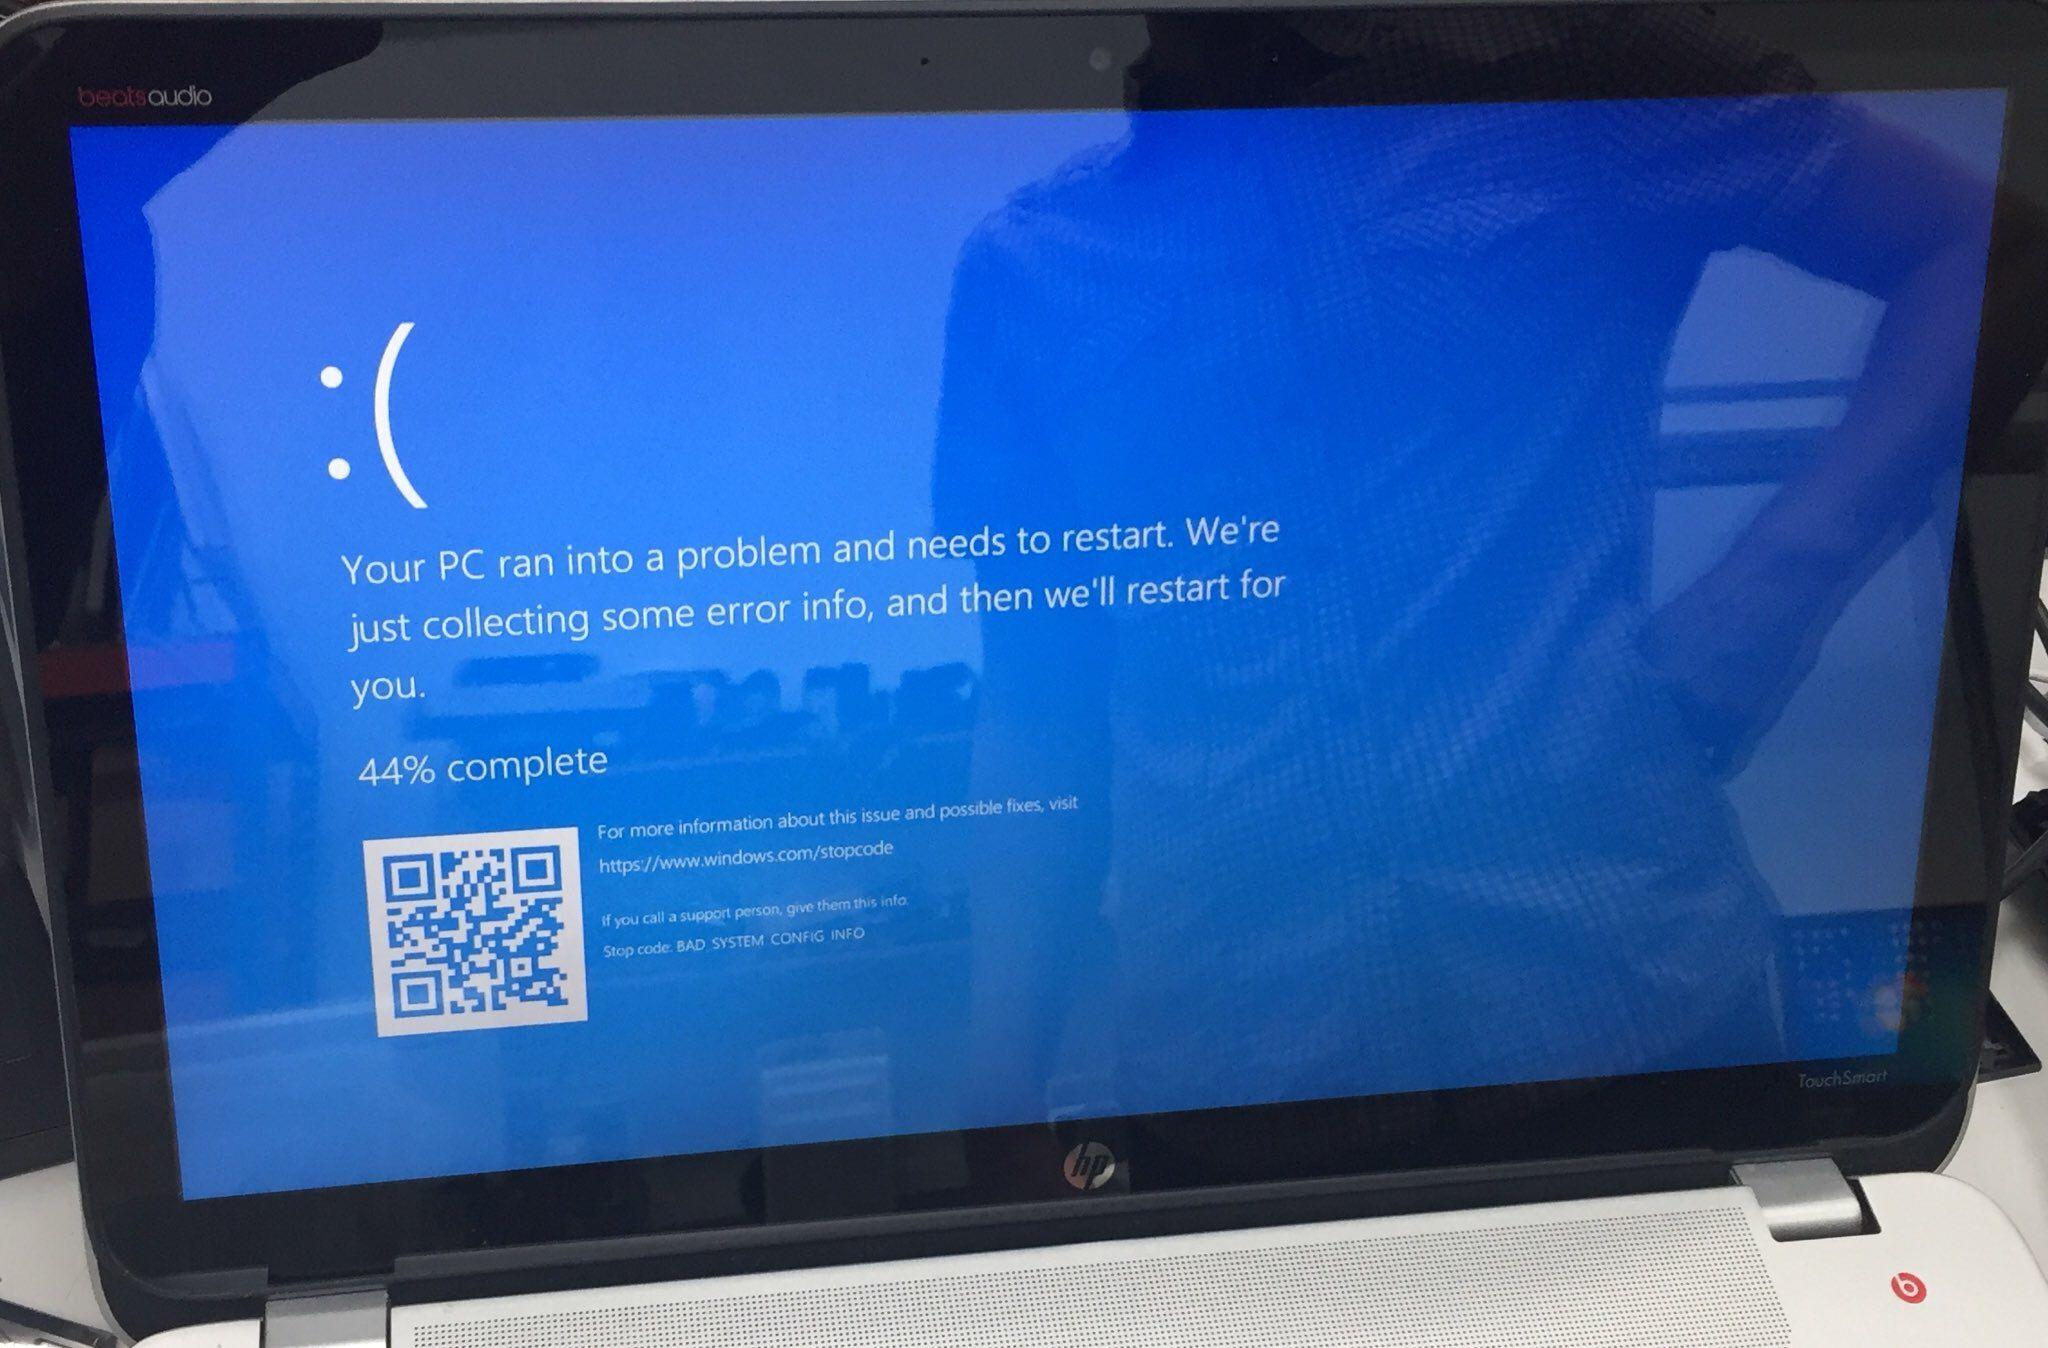 Hp Envy Touchsmart 15 Notebook Pc Error Screen Notebook Pc Envy Hard Disk